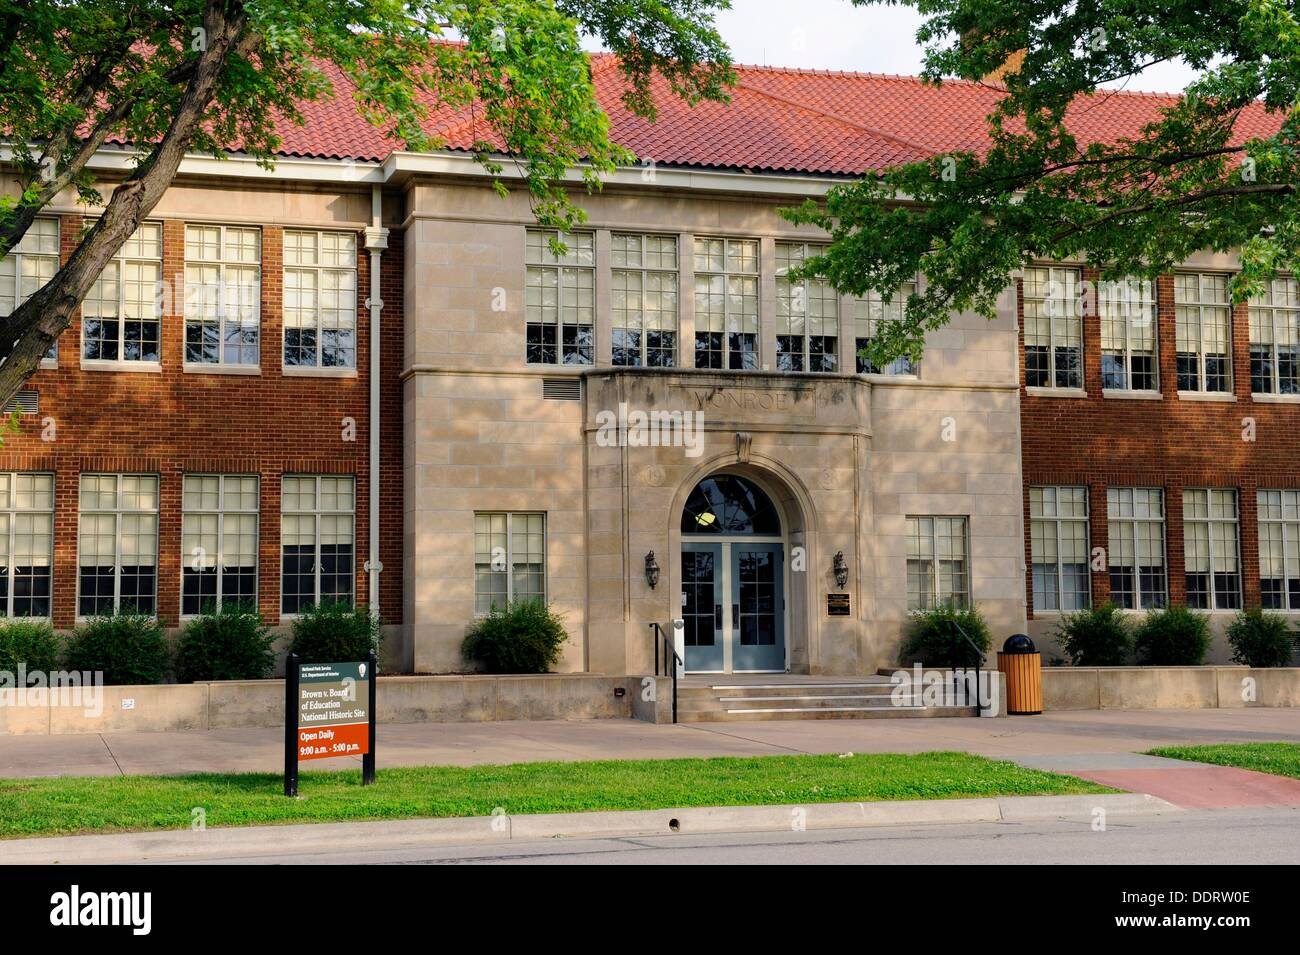 Monroe School Brown vs Board of Education Topeka Kansas - Stock Image